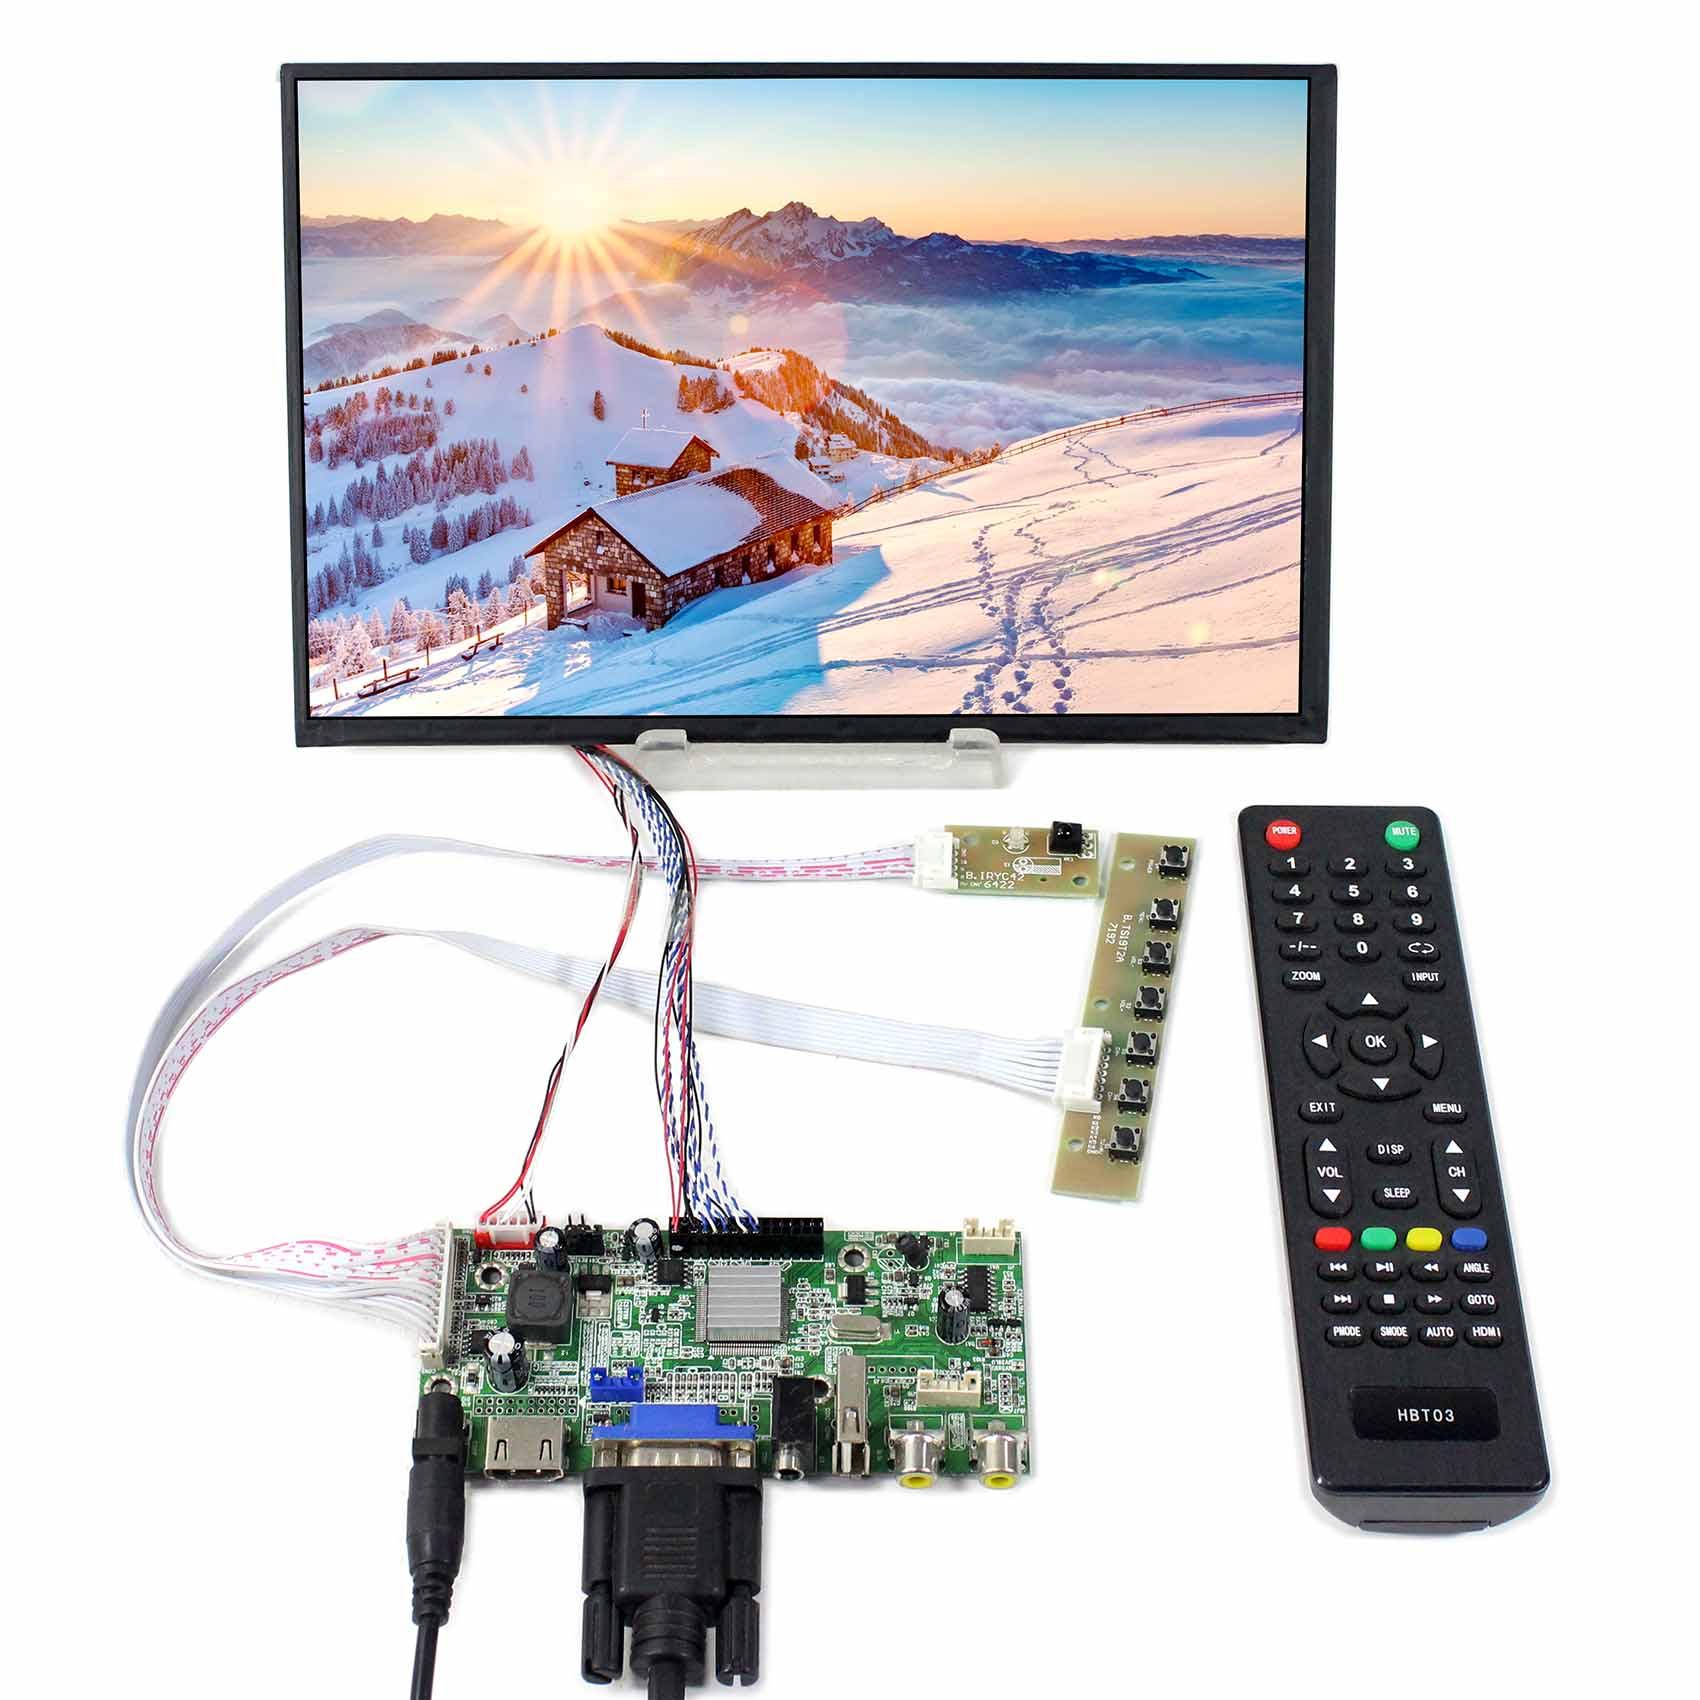 HDMI+VGA+AV+USB LCD Controller Board VS-V59AV-V1 work with 10.1inch M101NWWB 1280X800 LCD ScreenHDMI+VGA+AV+USB LCD Controller Board VS-V59AV-V1 work with 10.1inch M101NWWB 1280X800 LCD Screen